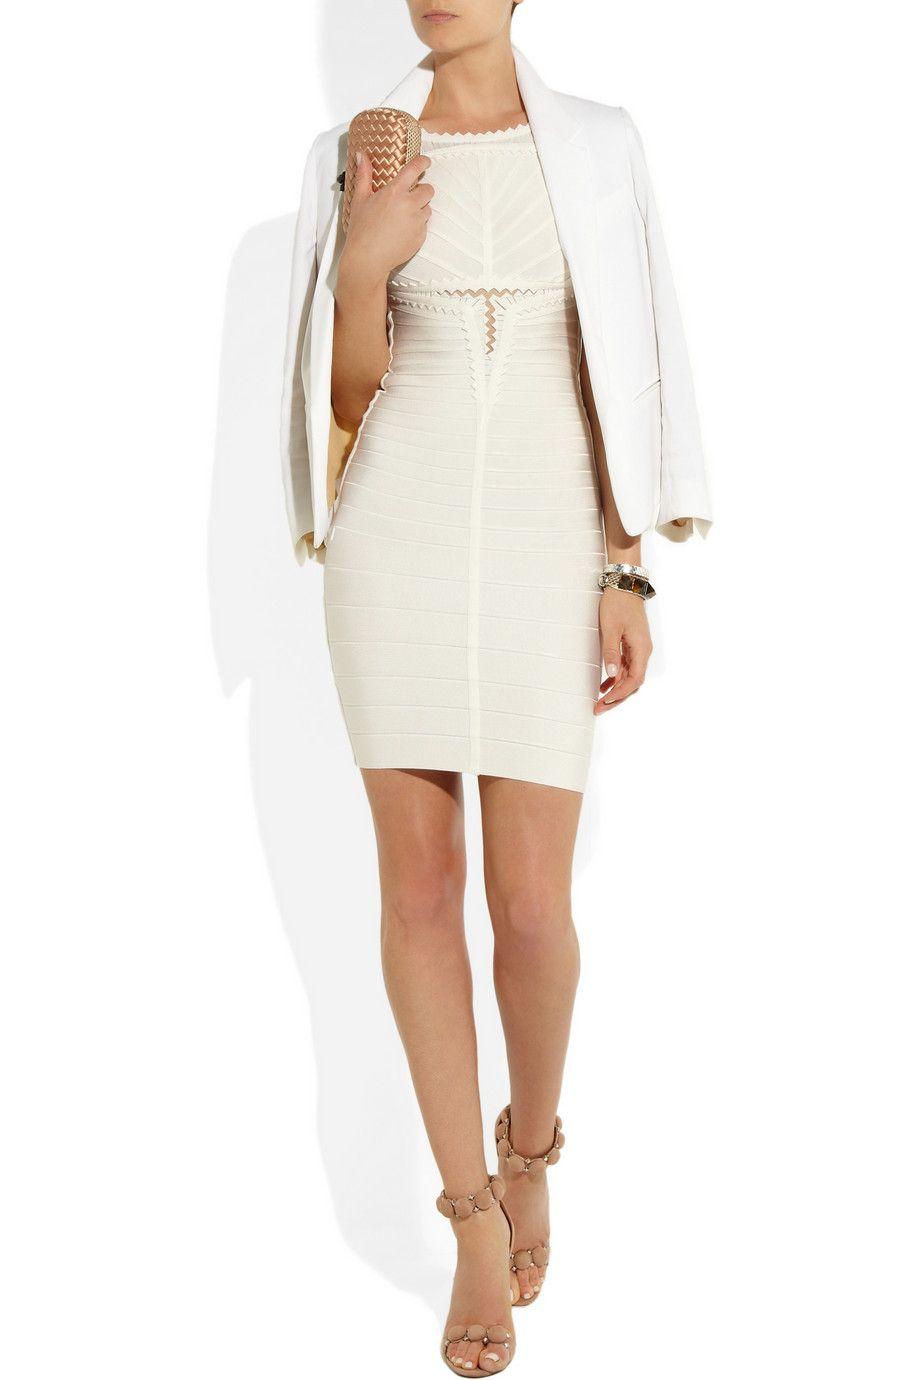 Herve leger white dress netaporter clothes pinterest